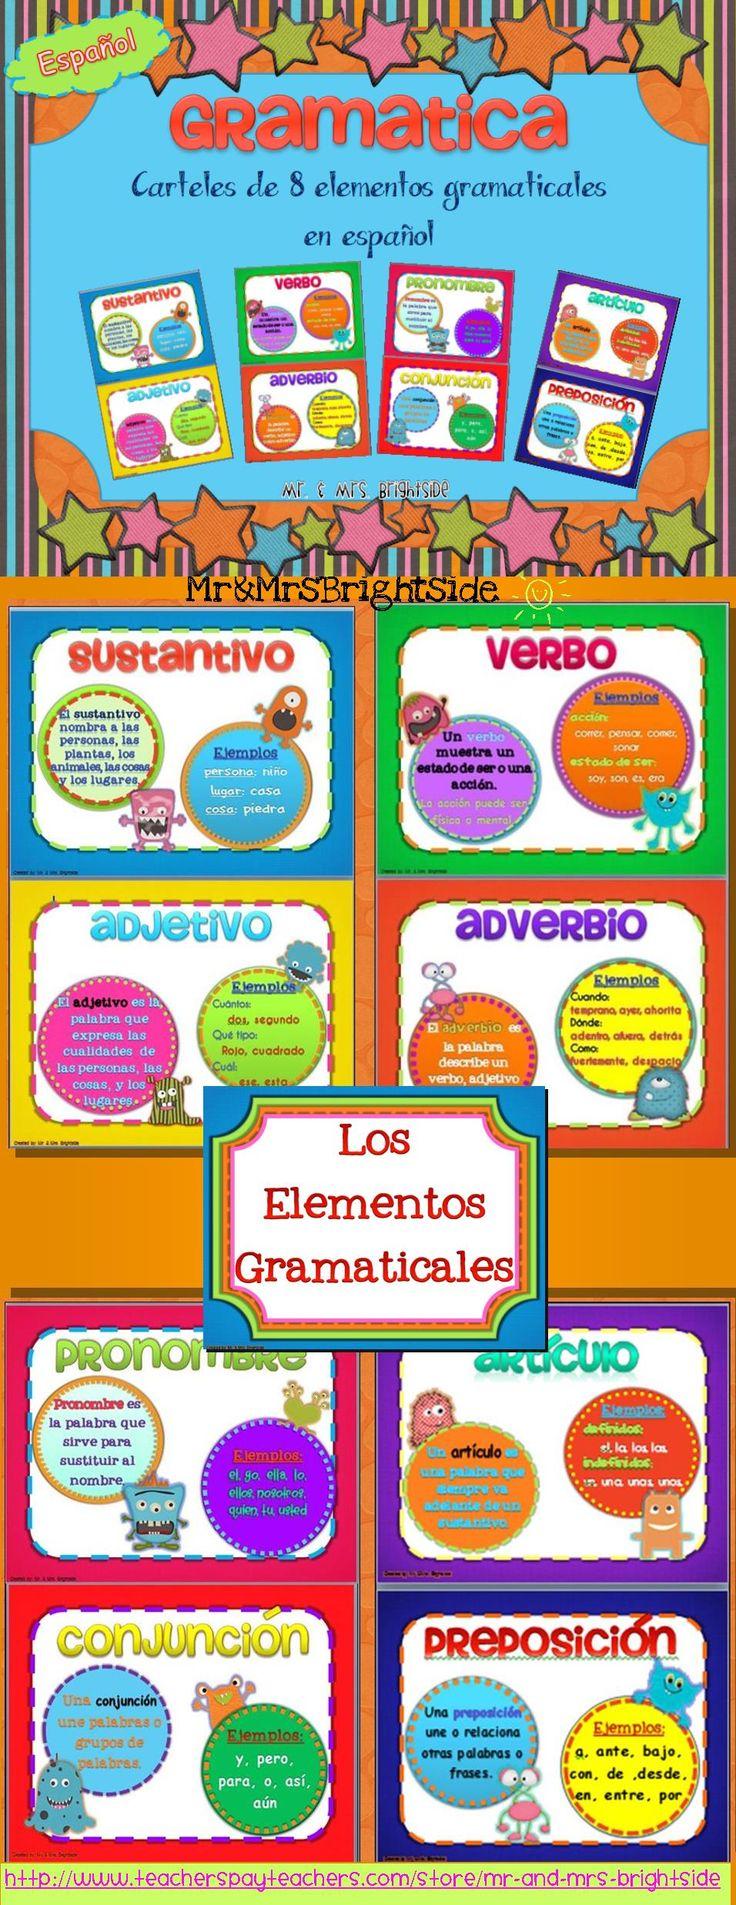 Grammar posters in Spanish for use in a bilingual or dual language classroom. Includes 9 signs in spanish: sustantivo, verbo, pronombre, articulo, adjetivo, adverbio, conjuncion, preposicion. $ #bilingual #gramatica